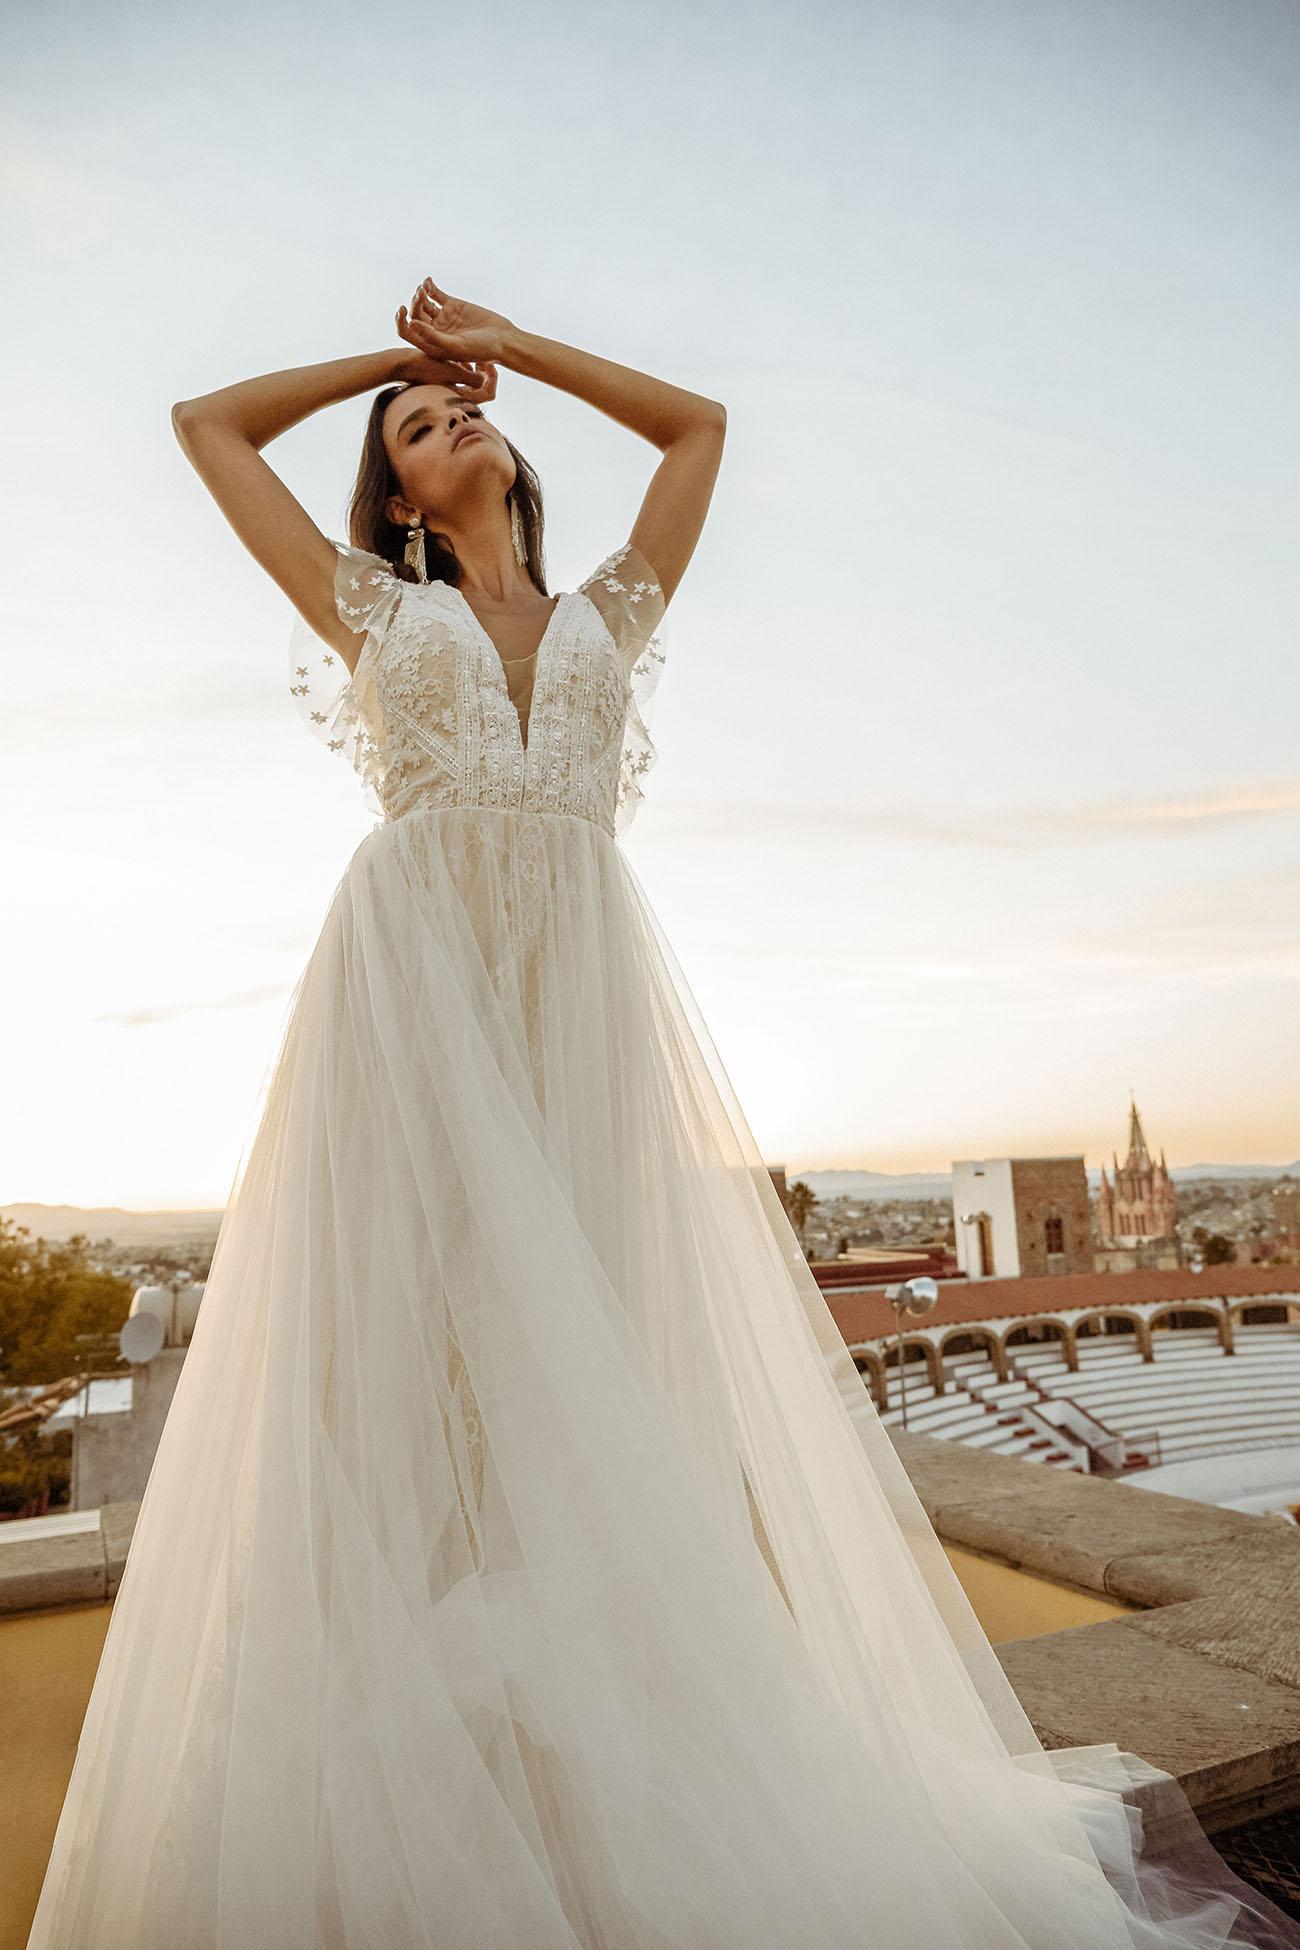 Introducing the Tara Lauren 2020 Collection: romantic, fresh, elevated bohemian wedding dresses.